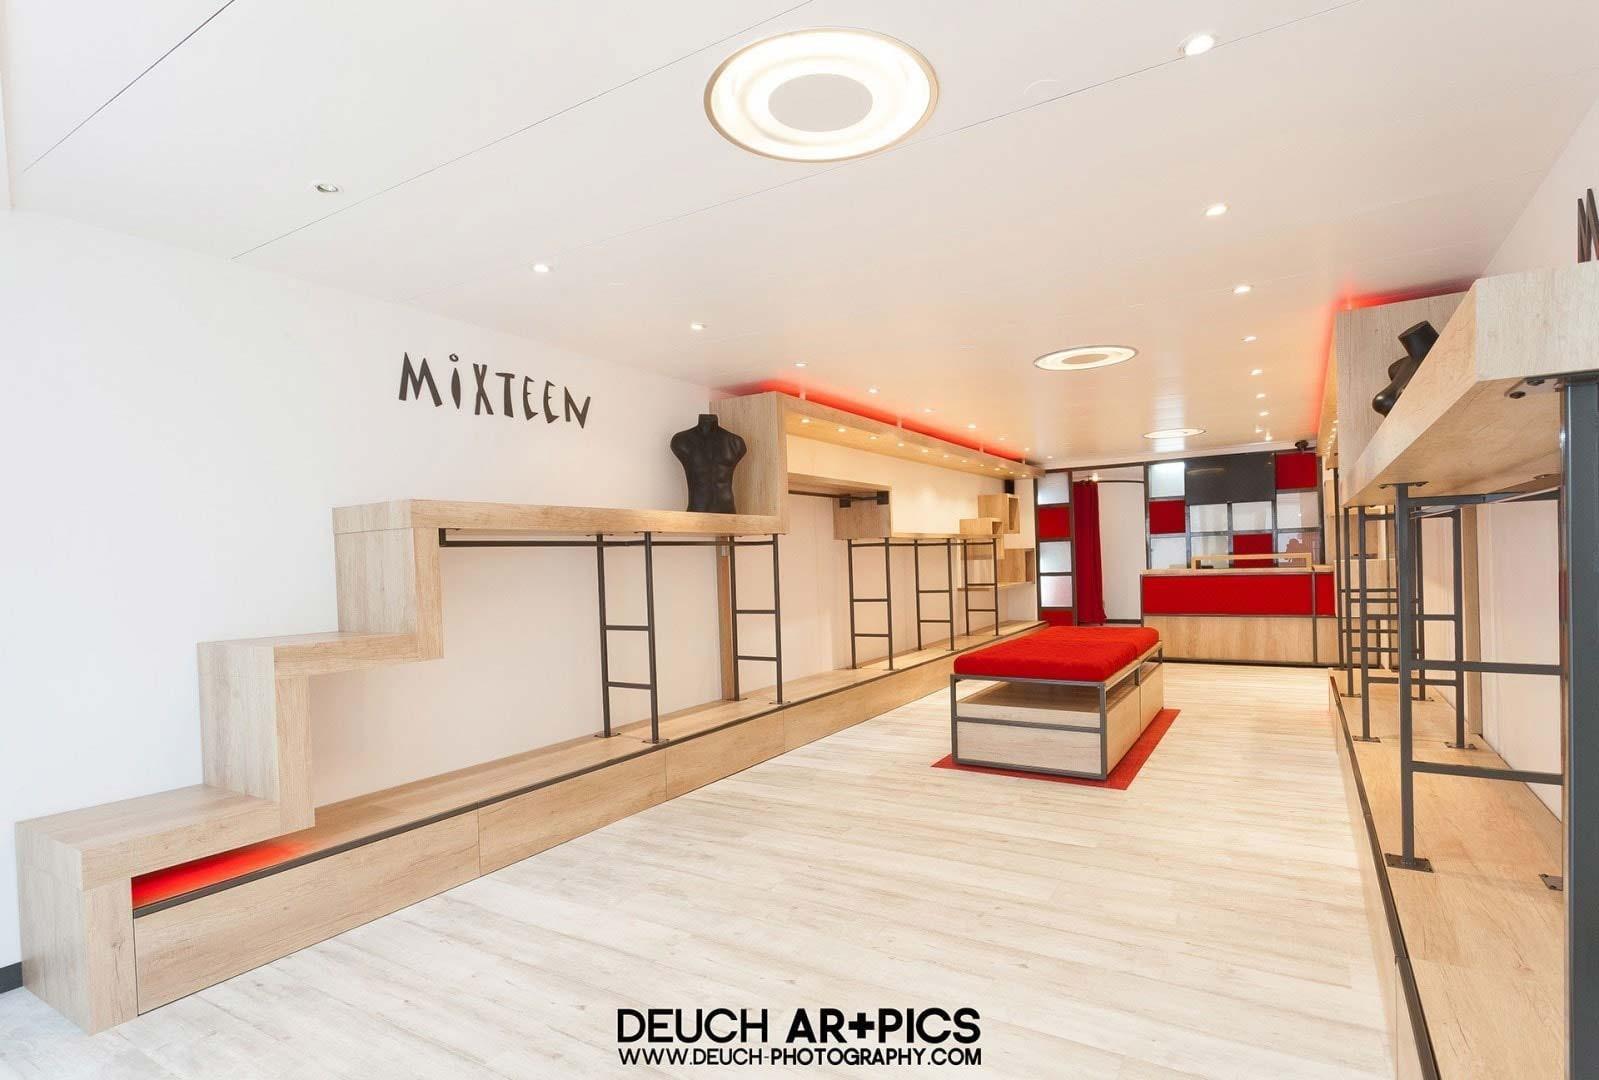 deuch-photography-photographe-interieur-franche-comte-belfort